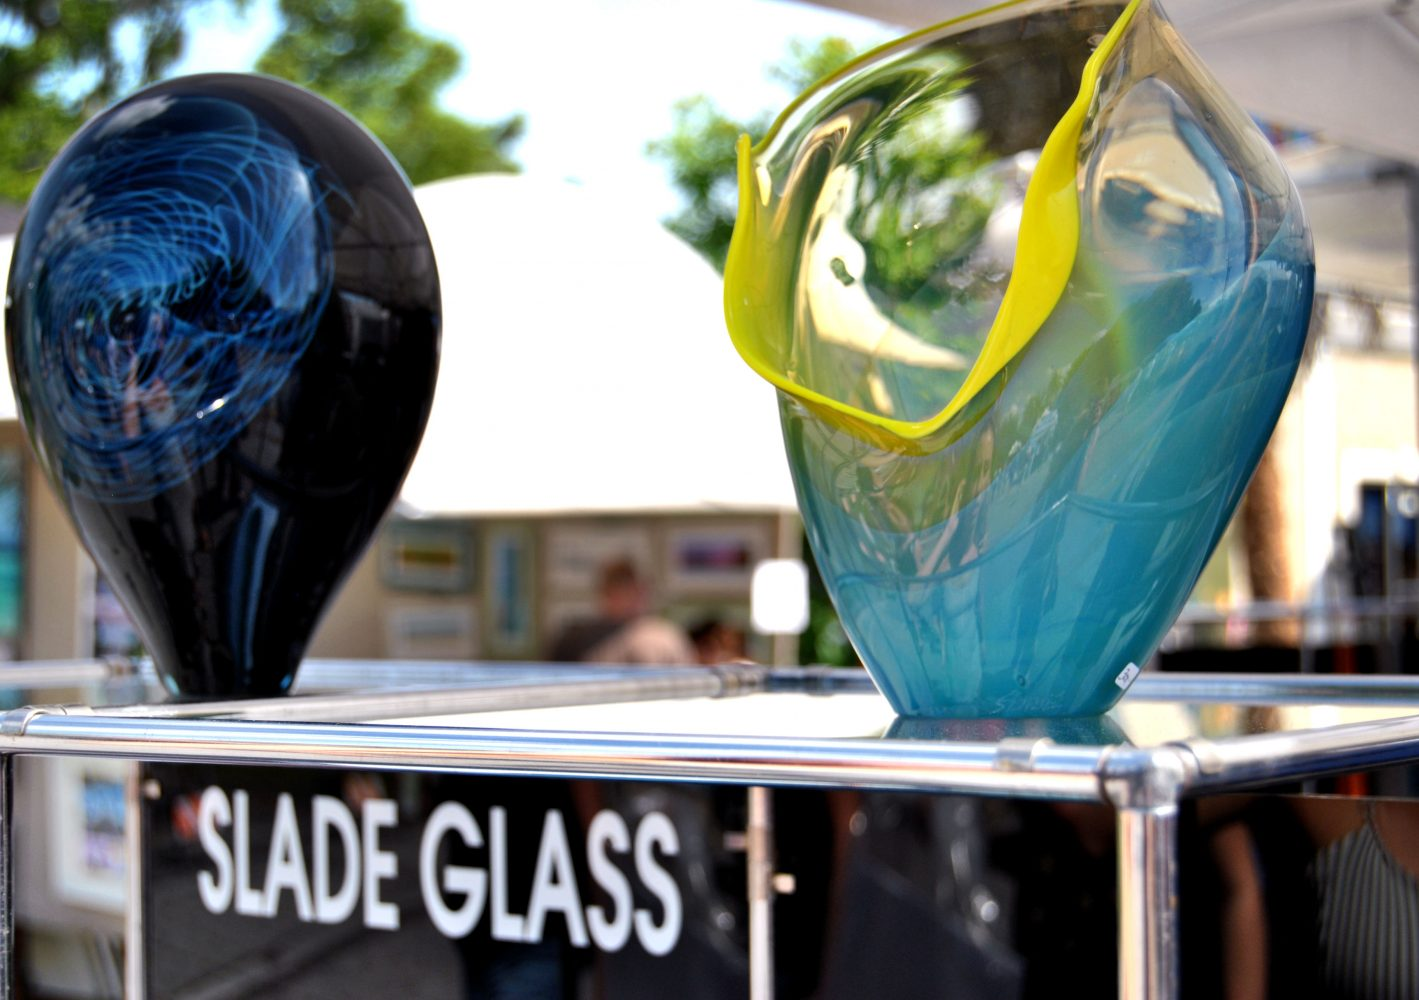 Bill and Jon Slade of Jacksonville presented Slade Glass at the Santa Fe College Springs Arts Festival.